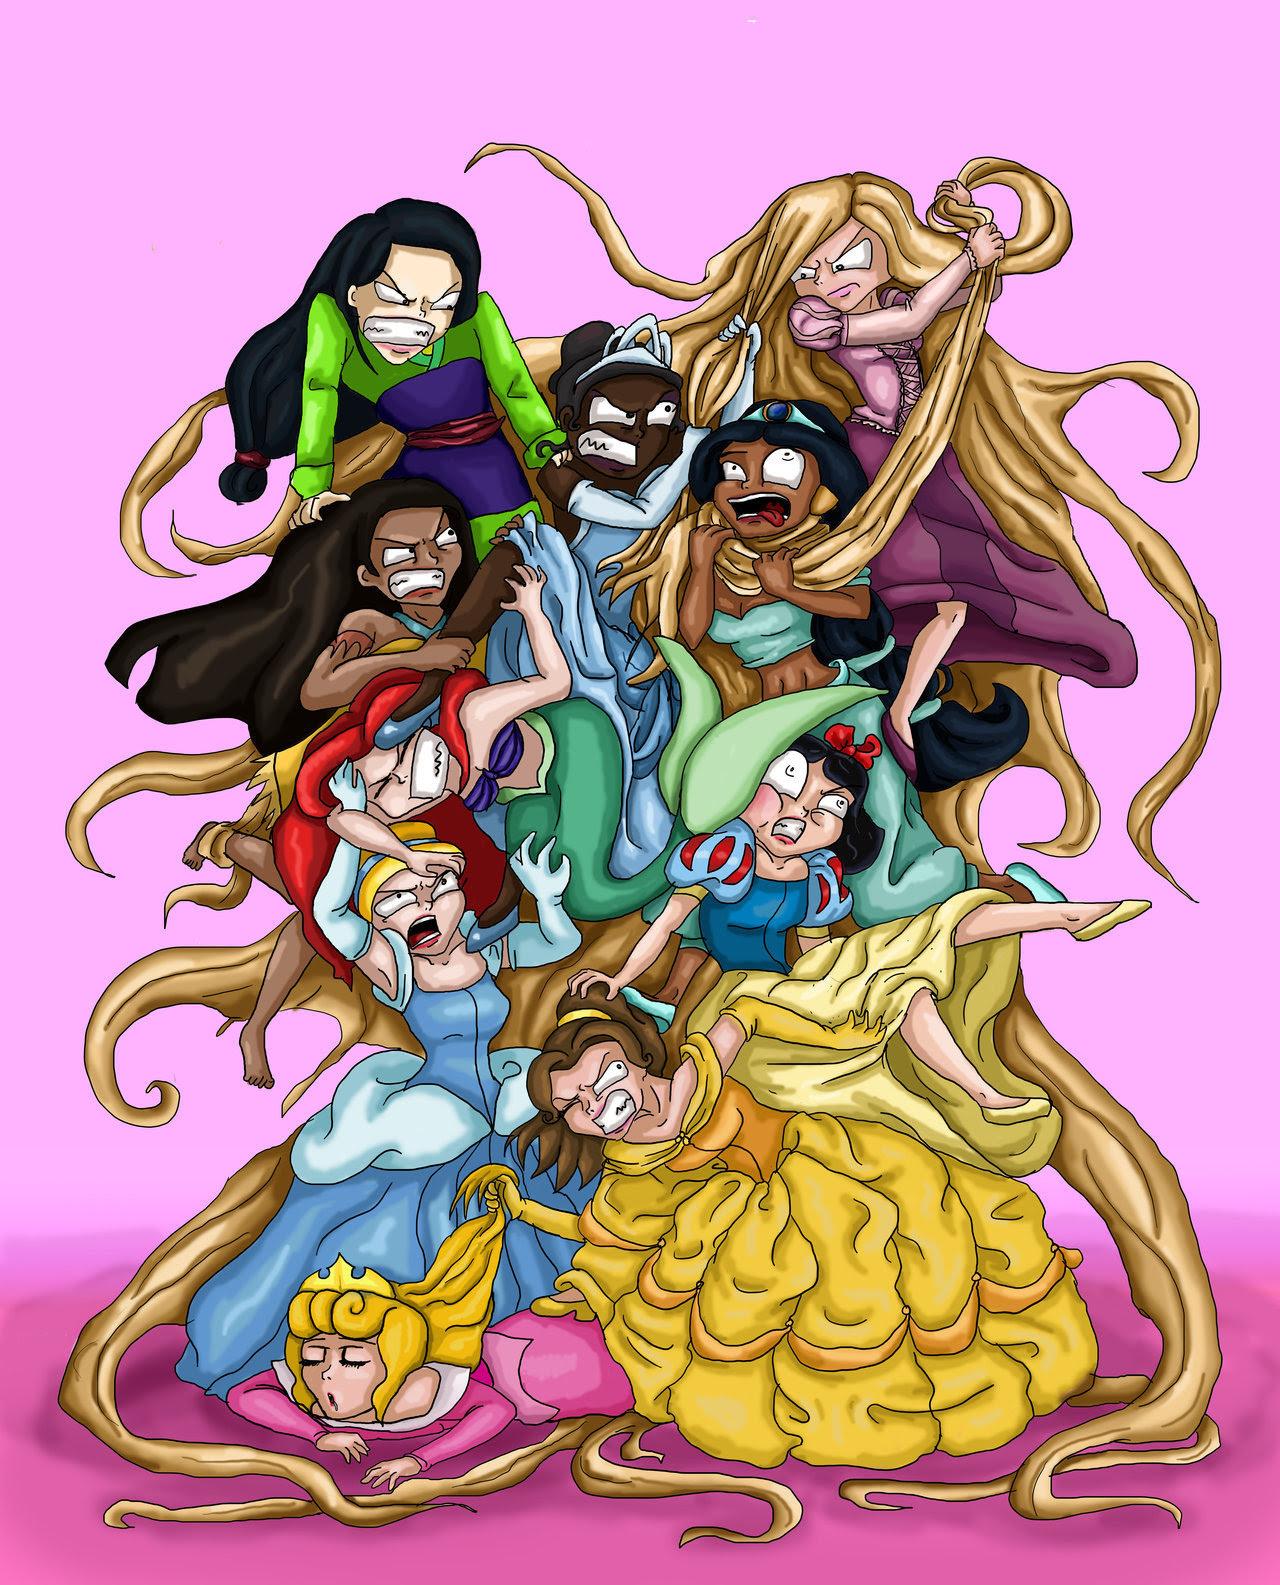 Princesas Disney peleando